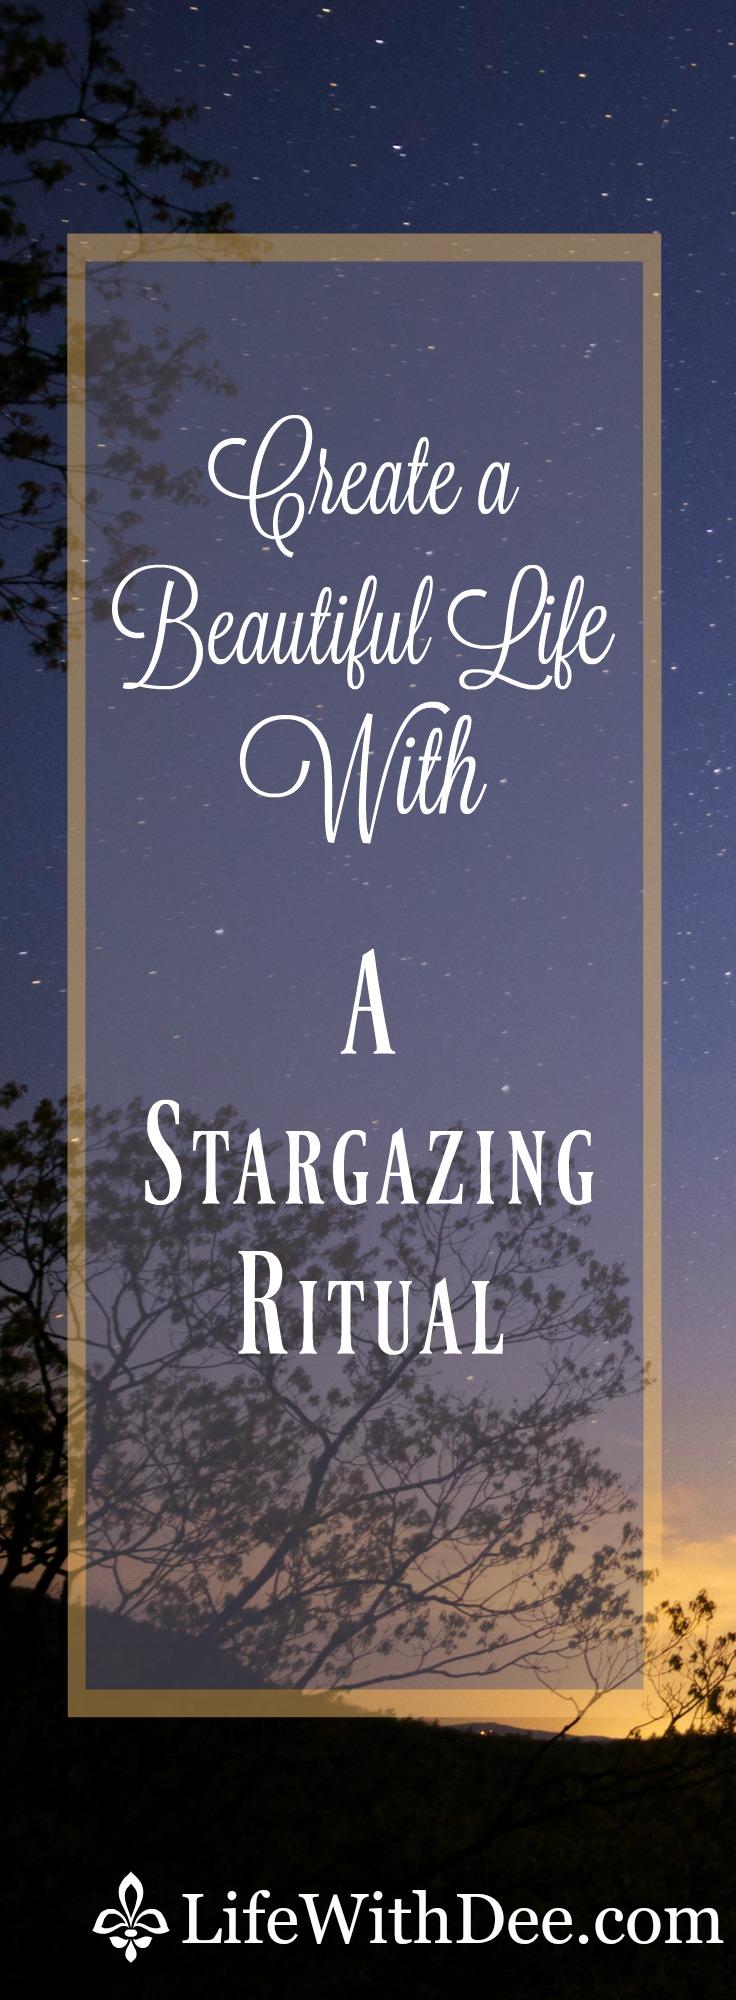 Star Gazing Ritual